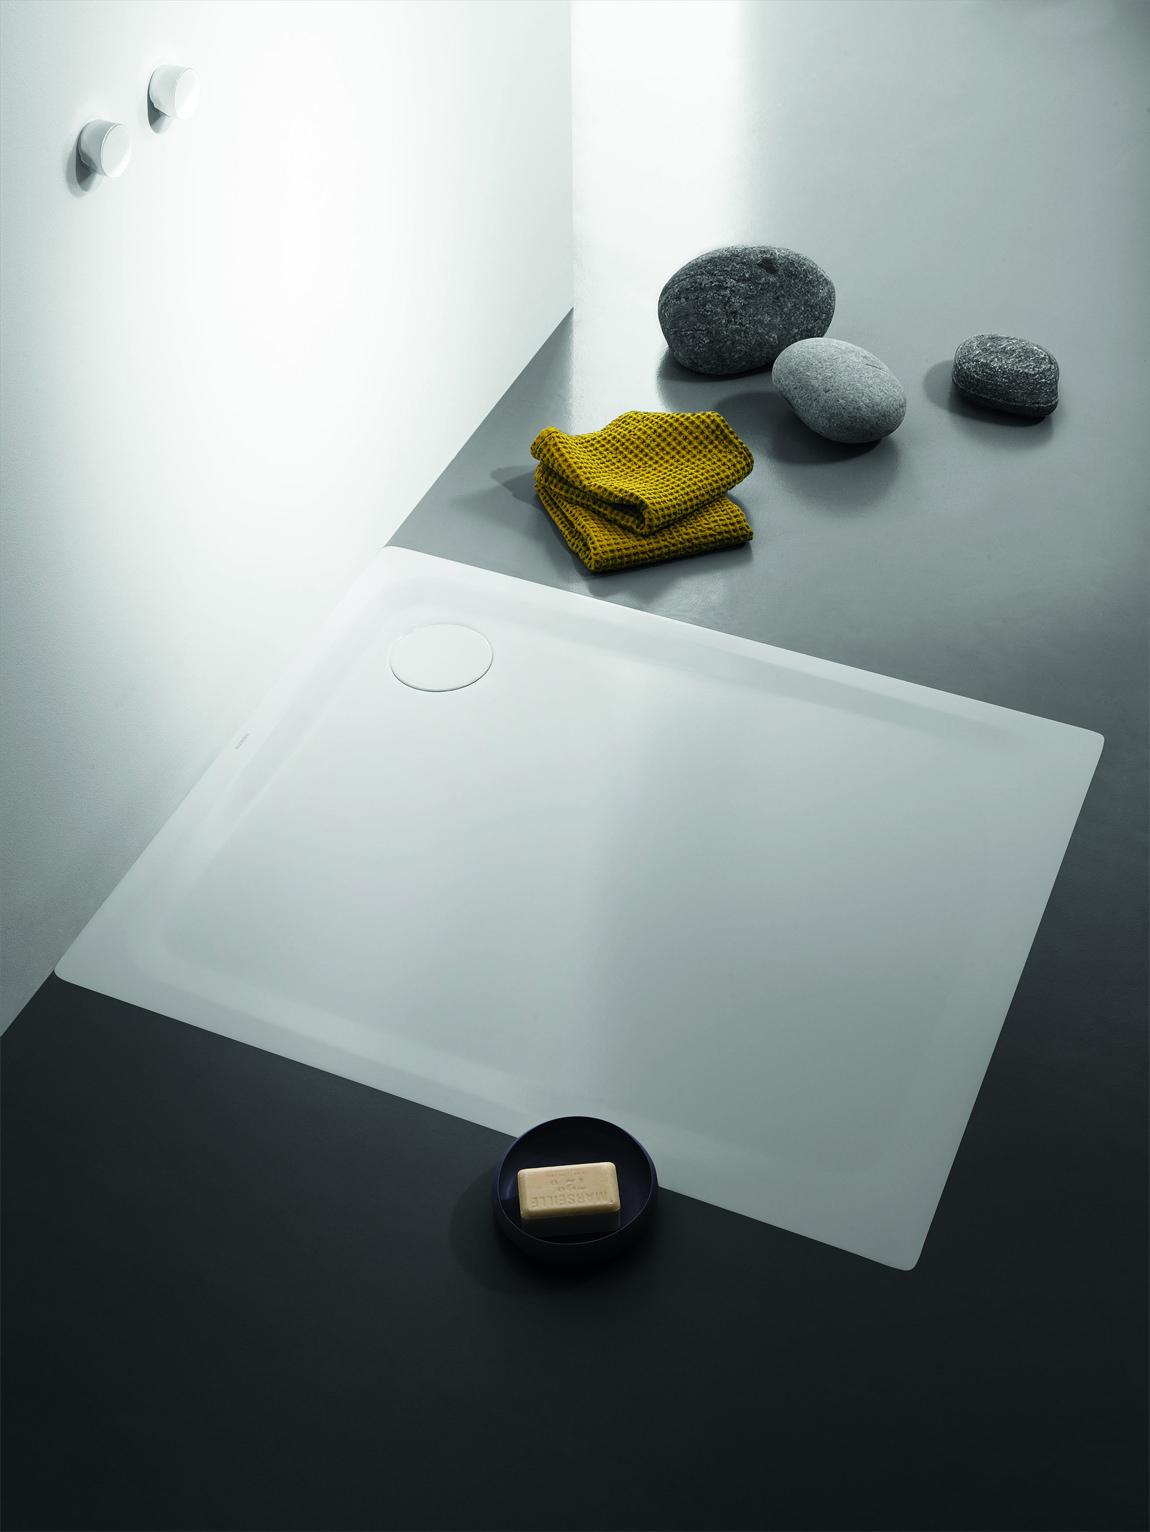 kaldewei avantgarde superplan plus 900 x 900mm steel shower tray. Black Bedroom Furniture Sets. Home Design Ideas